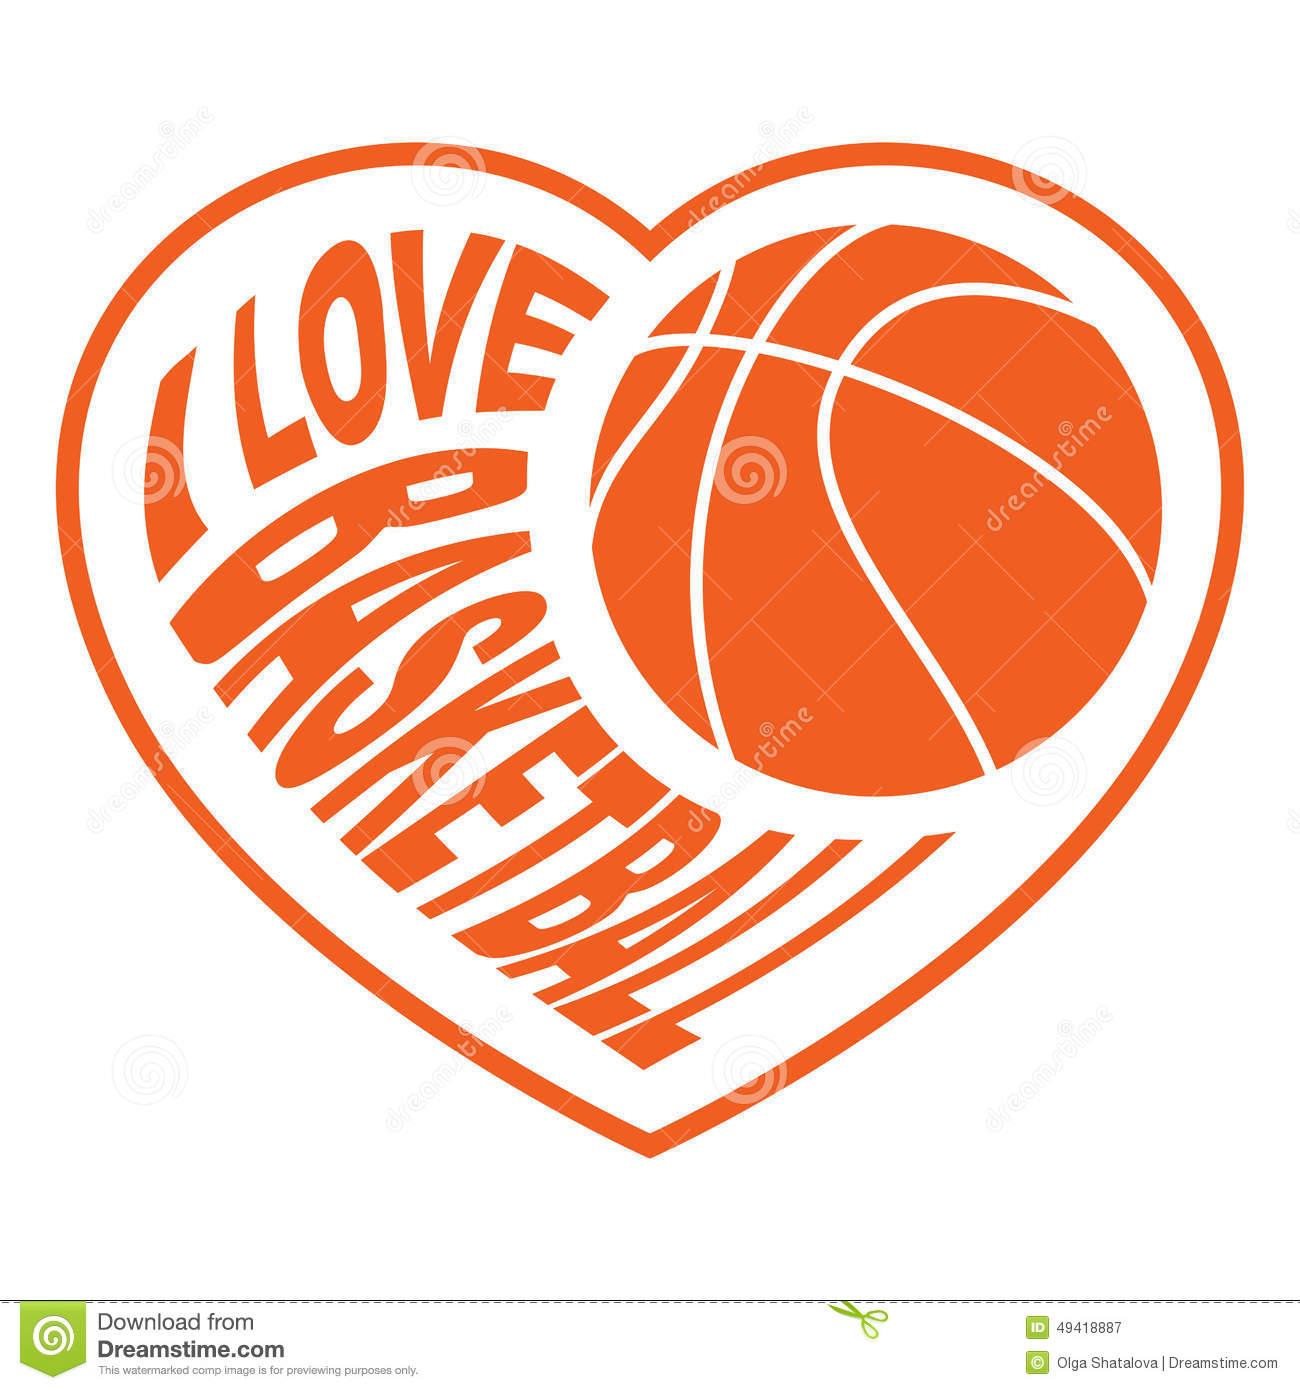 Basketball in heart 4 stock vector. Illustration of sport.